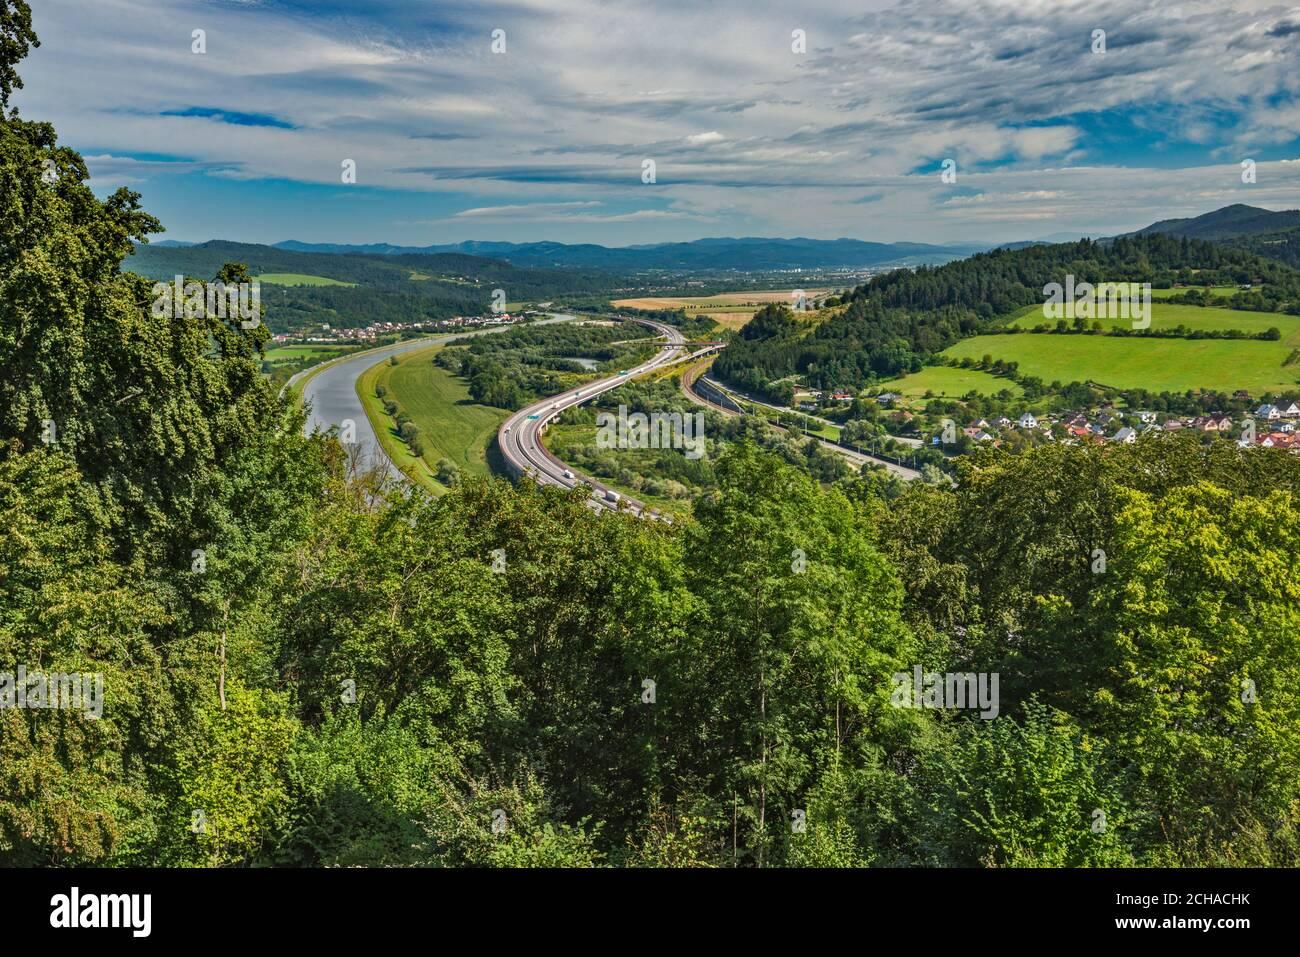 View of river Vah valley from Považský hrad (Hrad Bystrica), medieval castle over village of Považská Bystrica, Trencin Region, Slovakia Stock Photo